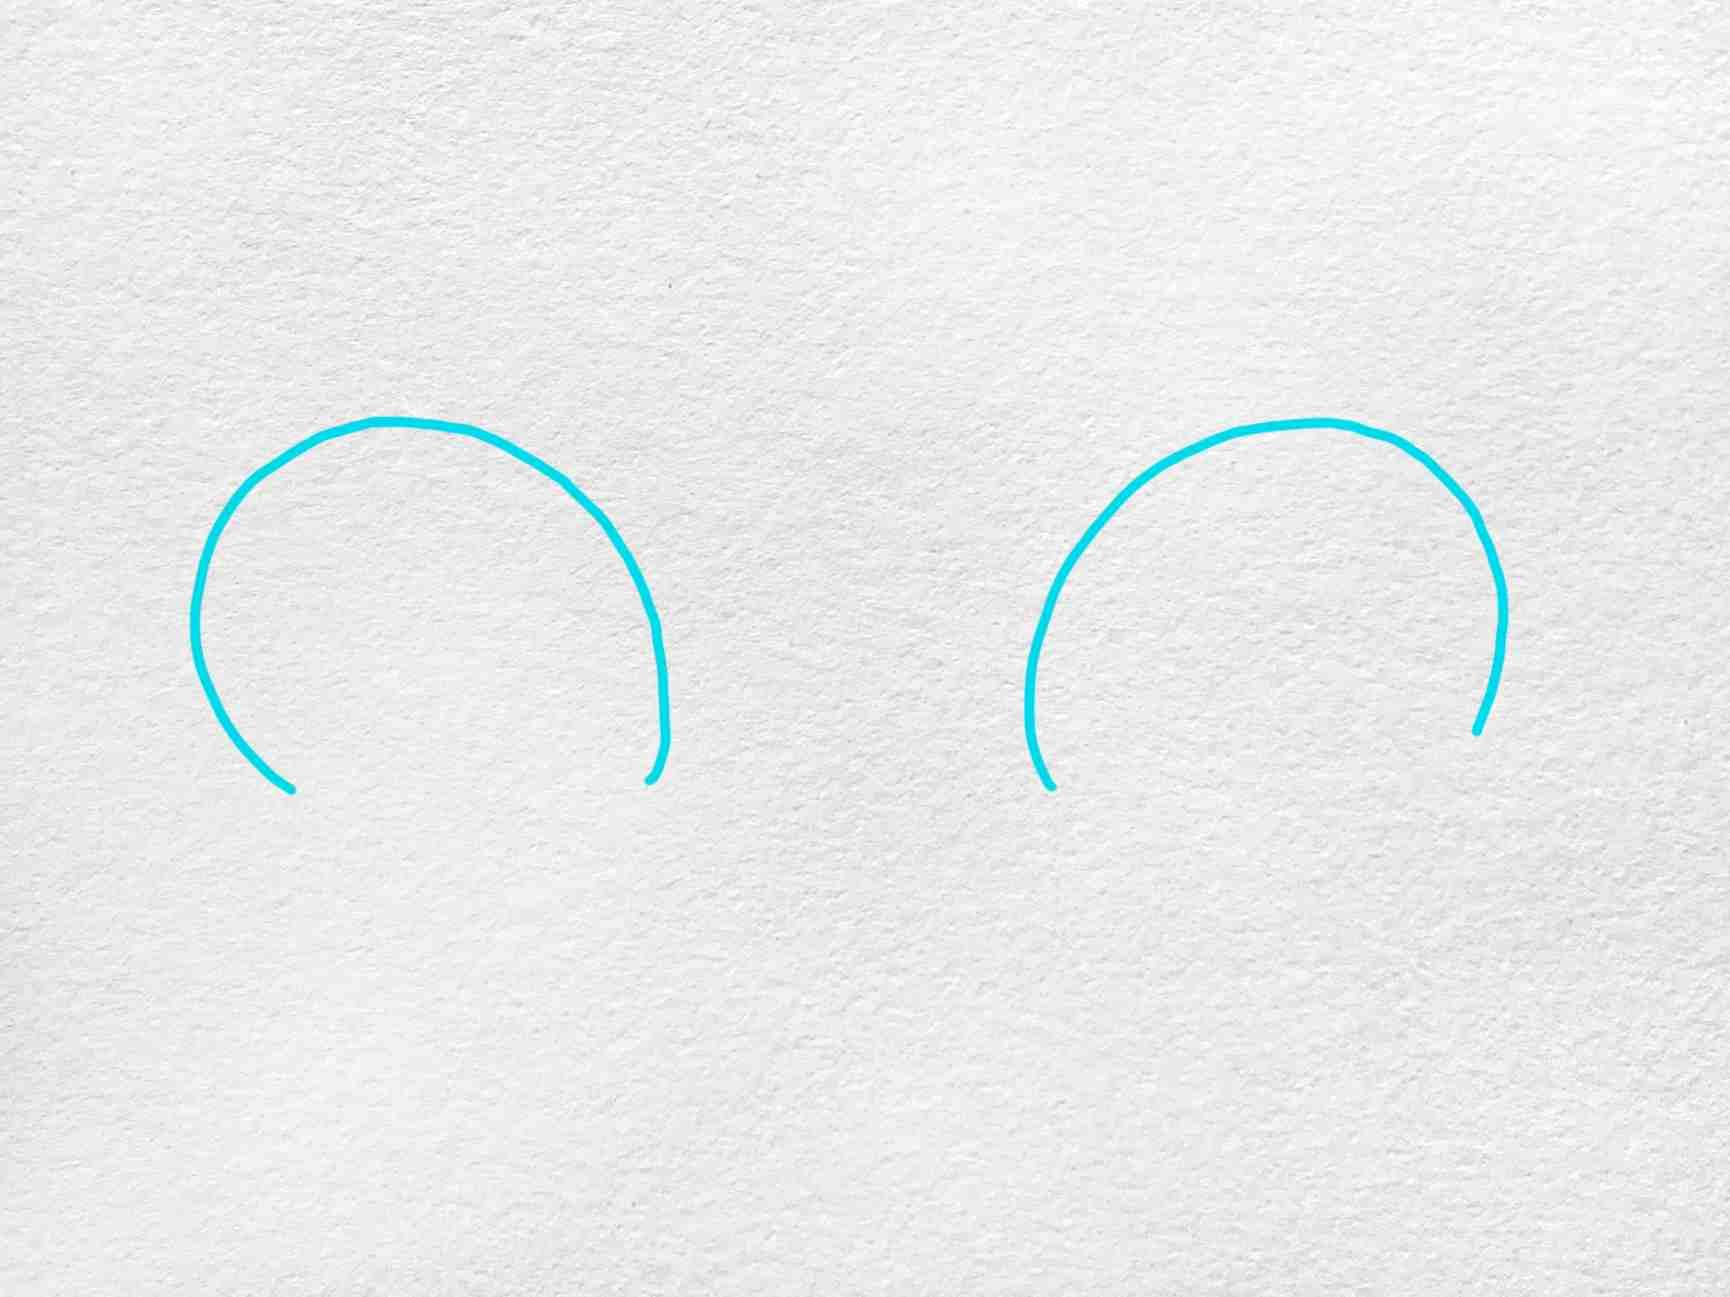 Cat Eyes Drawing: Step 1